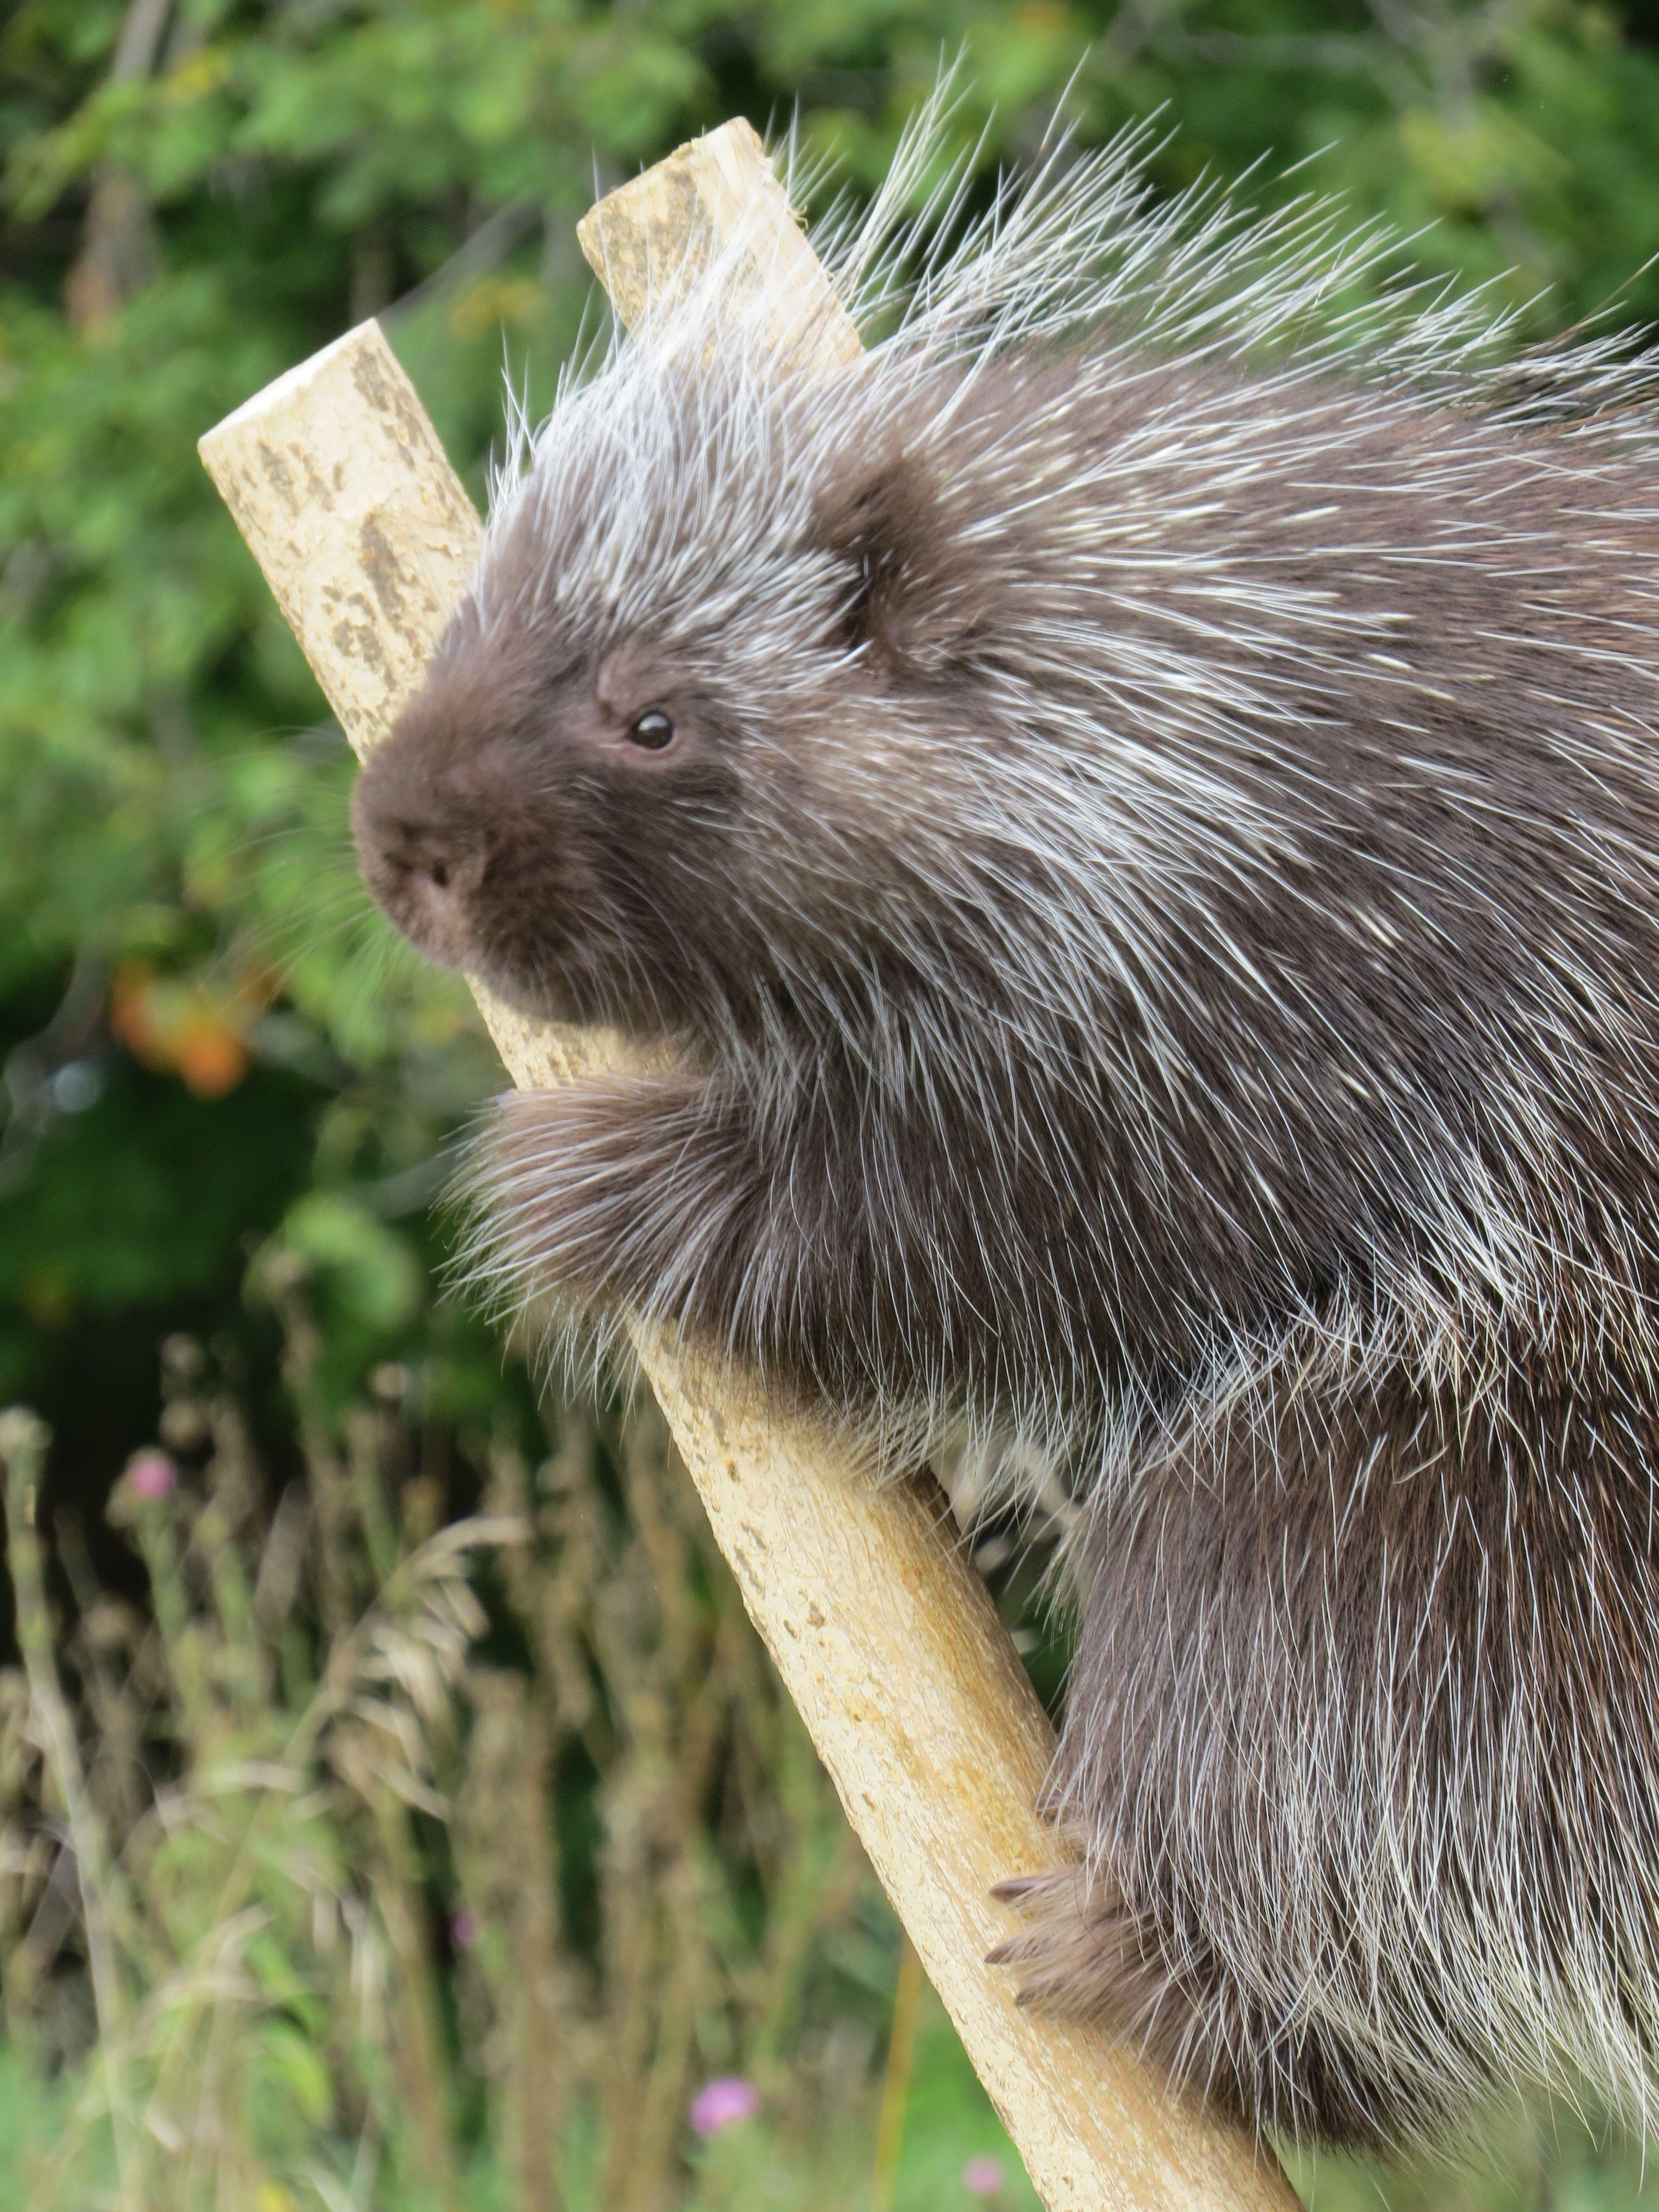 porcupine by Patty McQuiston